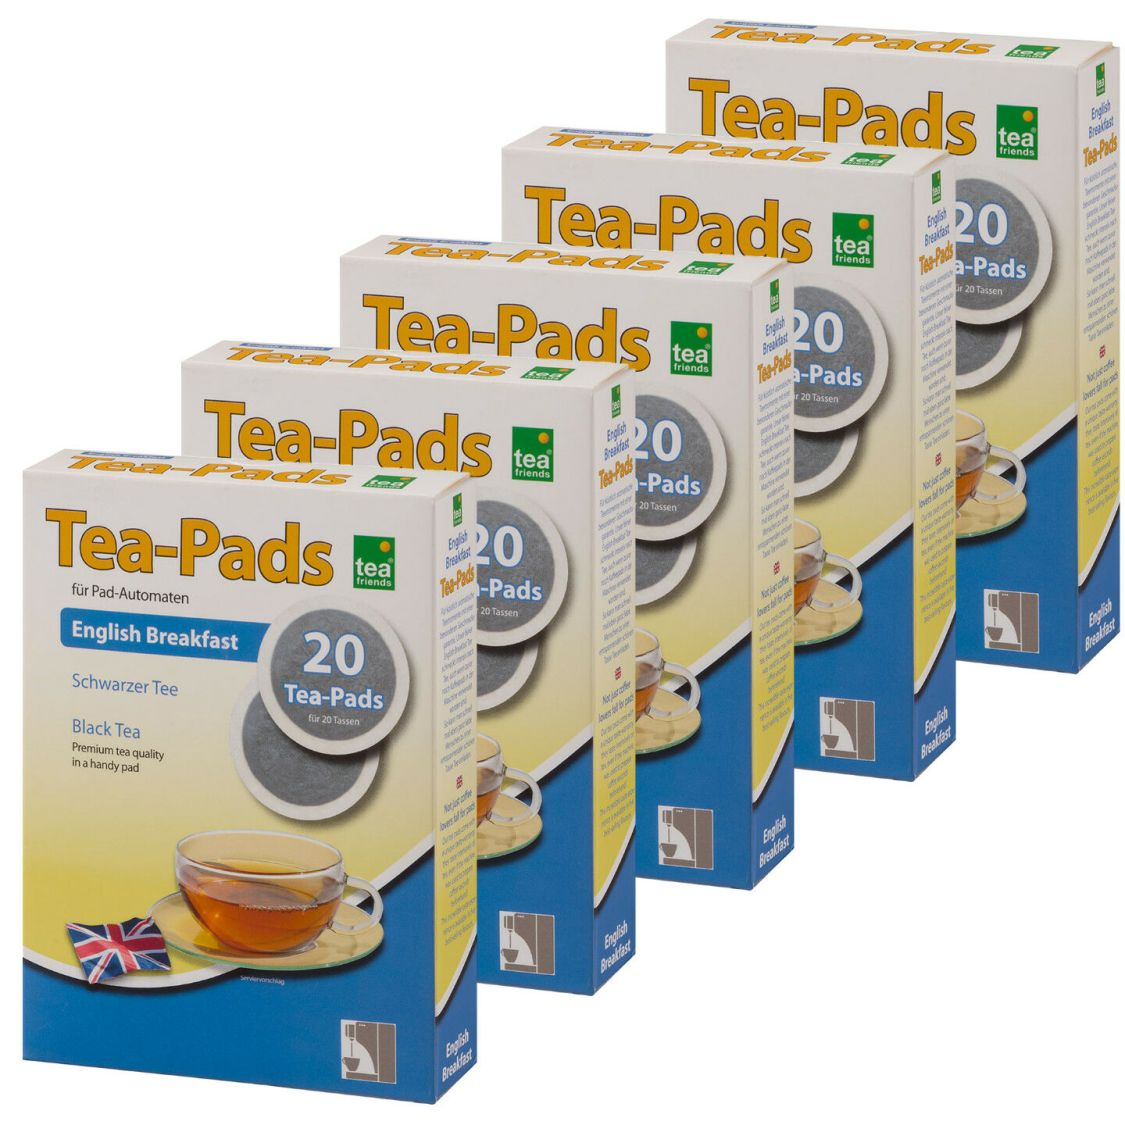 100 Tee Pads (5Pkg)  -ENGLISH BREAKFAST- Tea-Pad  Tea-Friends - Senseo geeignet